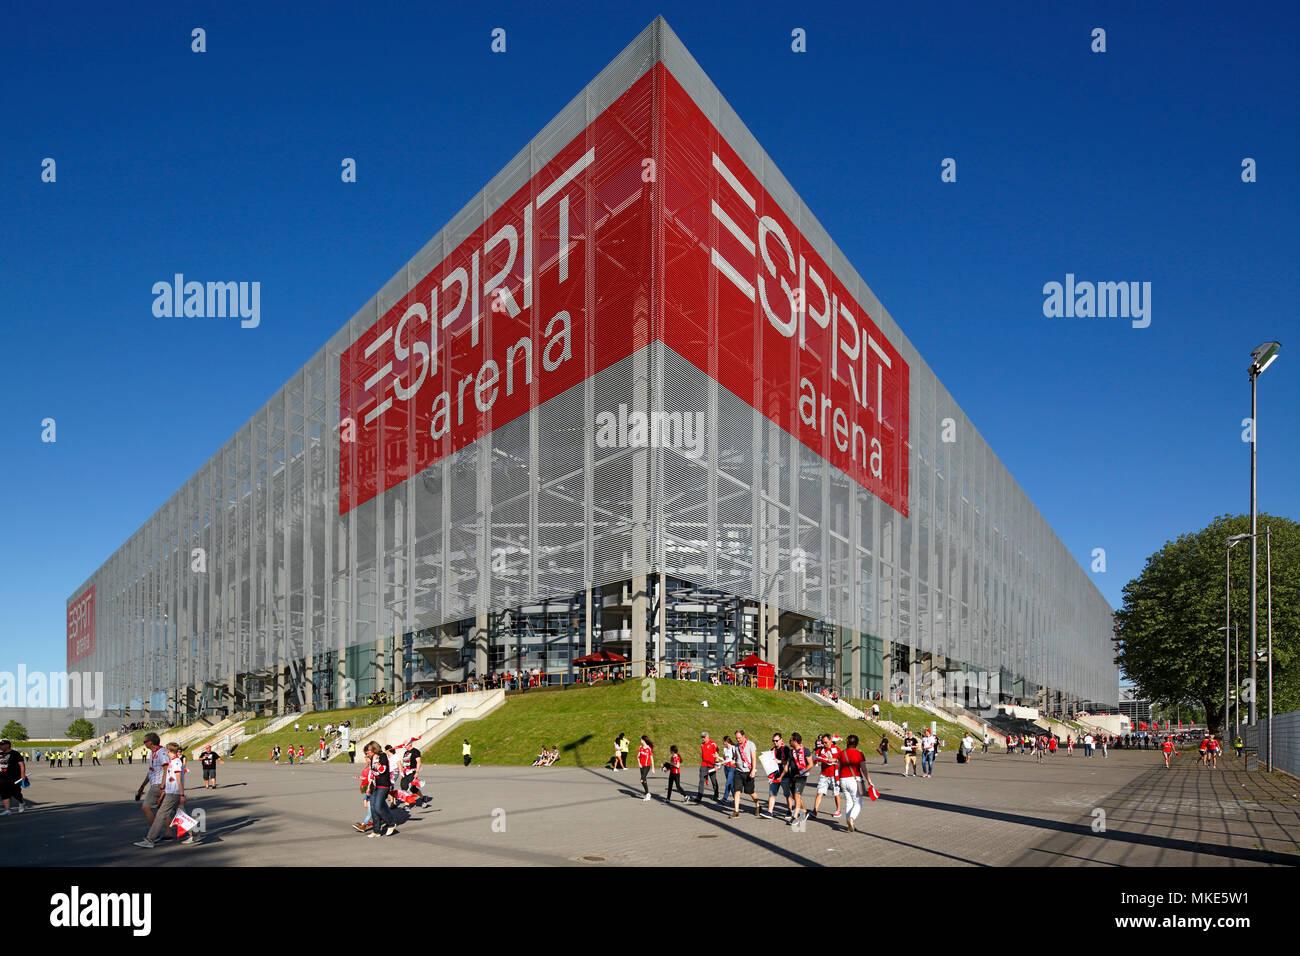 sports,football,2. Bundesliga,2017/2018,Fortuna Duesseldorf vs Holstein Kiel 1:1,Esprit arena Duesseldorf,stadium view,football fans - Stock Image